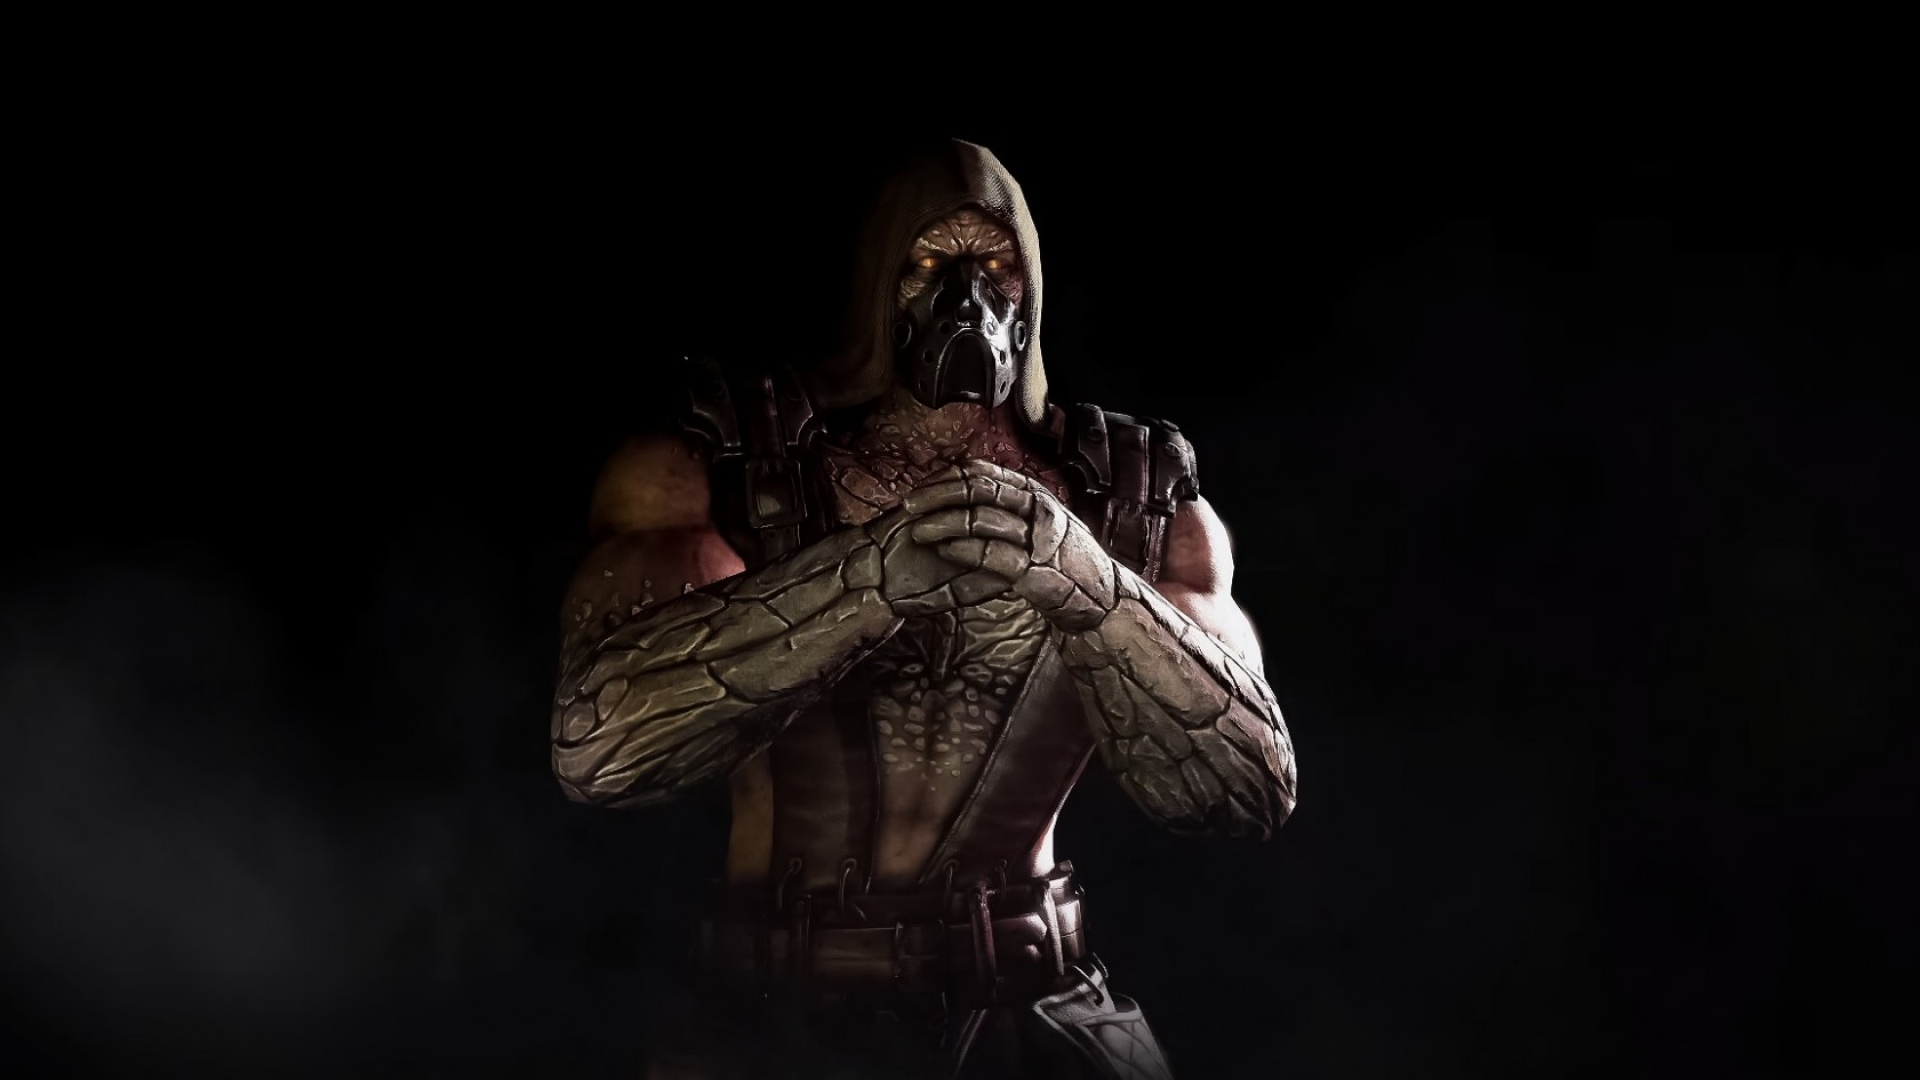 Free Download Download Tremor Mortal Kombat X Hd Wallpaper Search